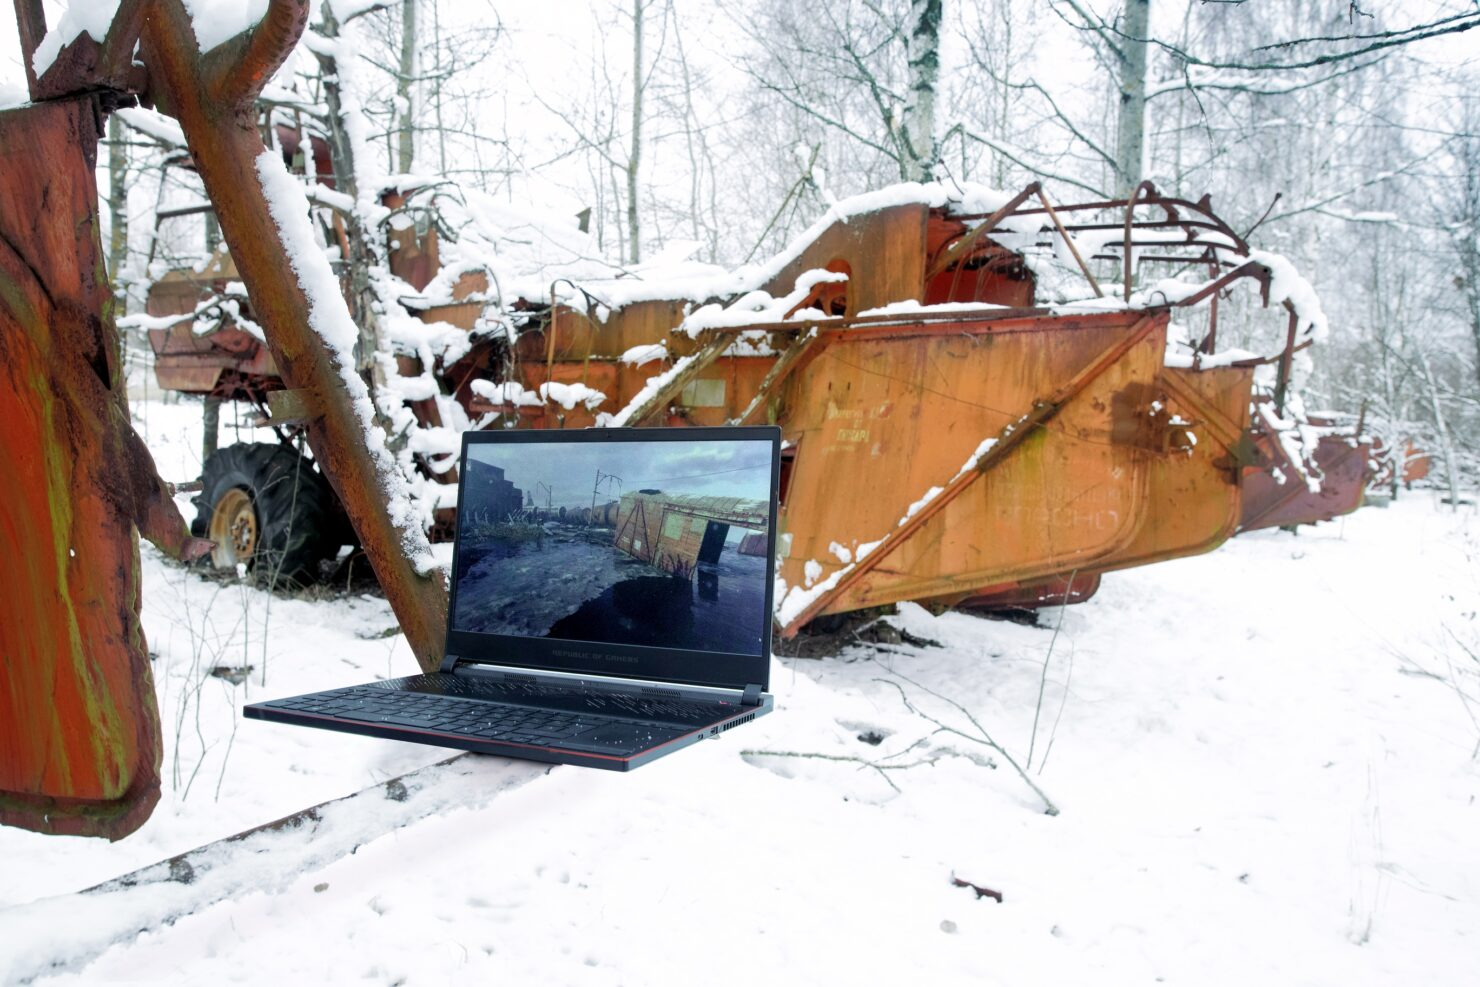 metro-exodus-brought-to-life-03-laptop-04